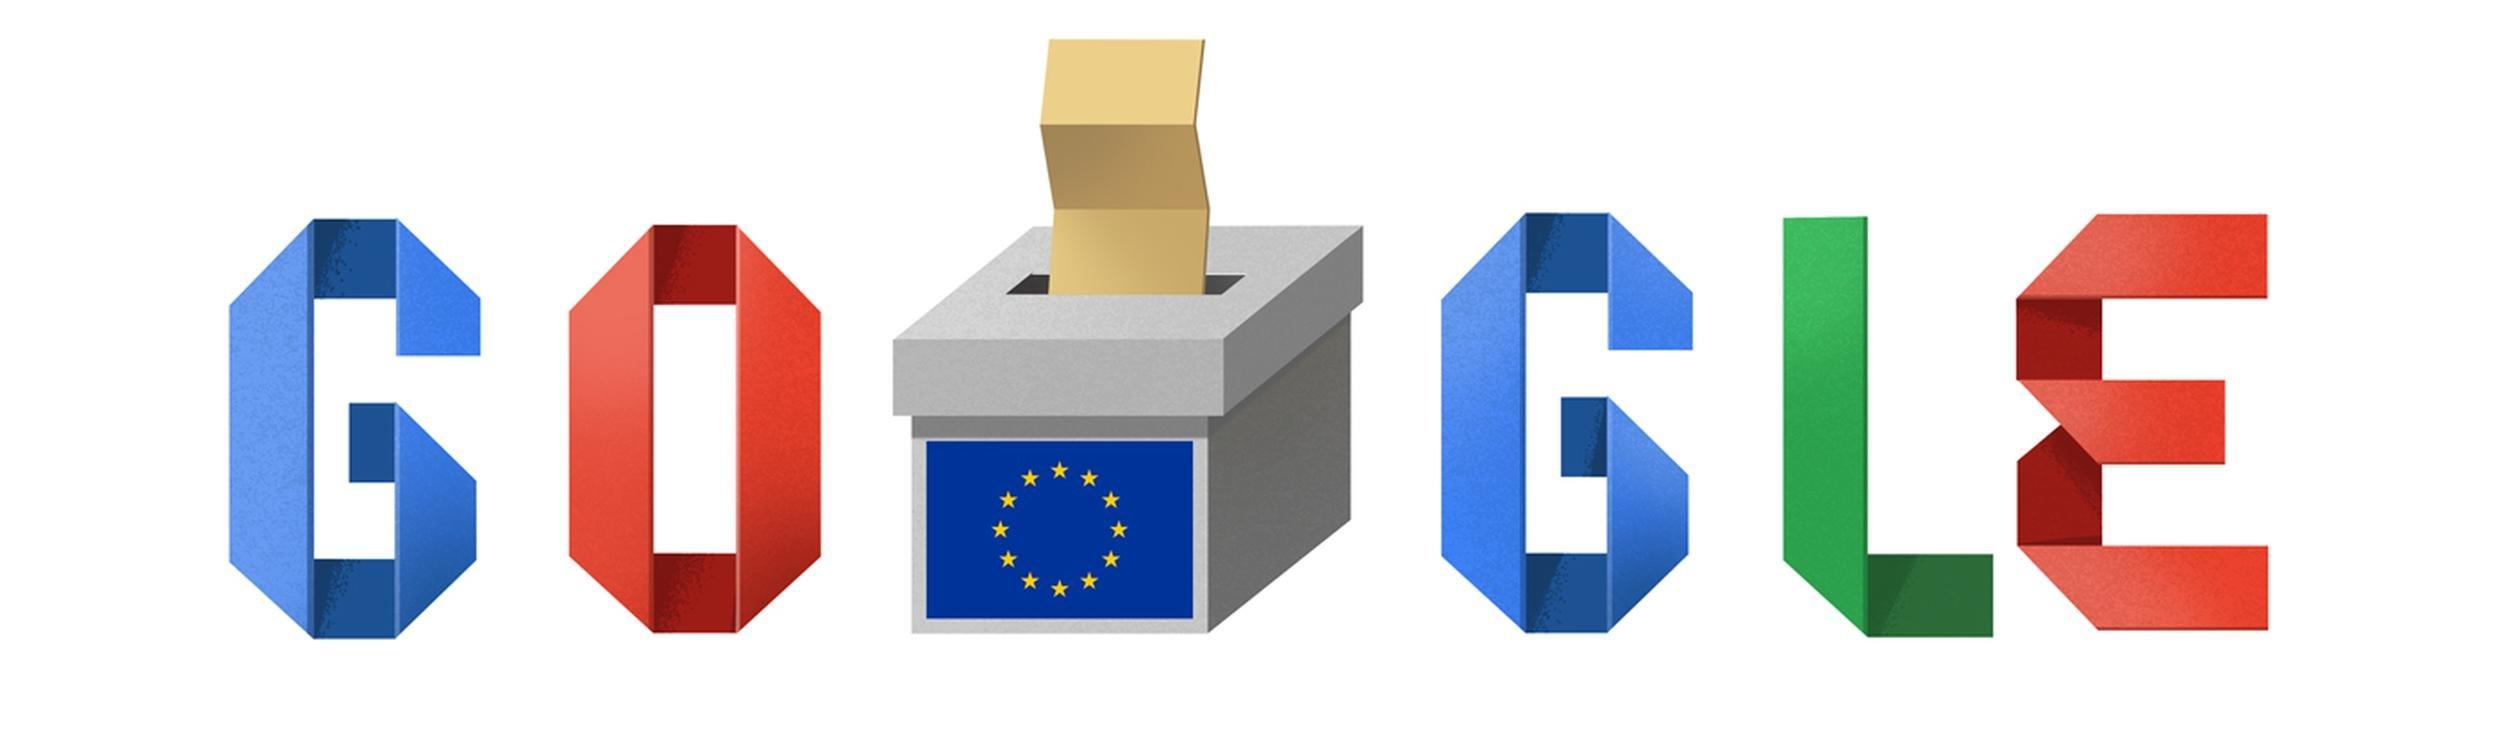 europawahl wahlhilfe eu wahl 2019 google doodle